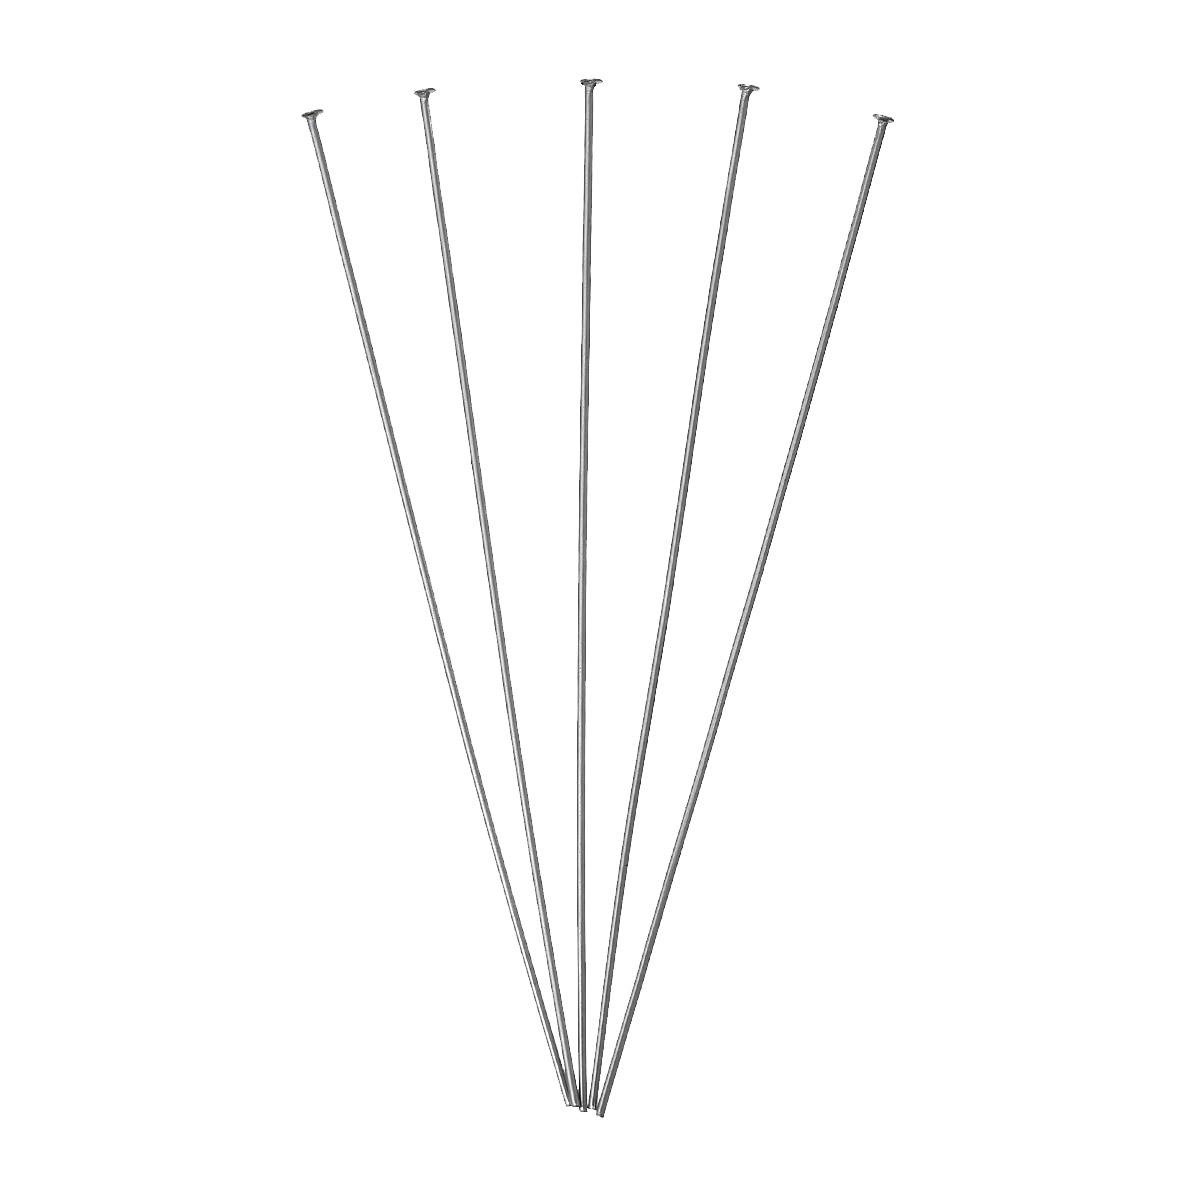 DoreenBeads Stainless Steel Head Pins Silver Tone 7.5cm(3) long, 0.7mm ( gauge,) 10 Pieces 2017 newDoreenBeads Stainless Steel Head Pins Silver Tone 7.5cm(3) long, 0.7mm ( gauge,) 10 Pieces 2017 new